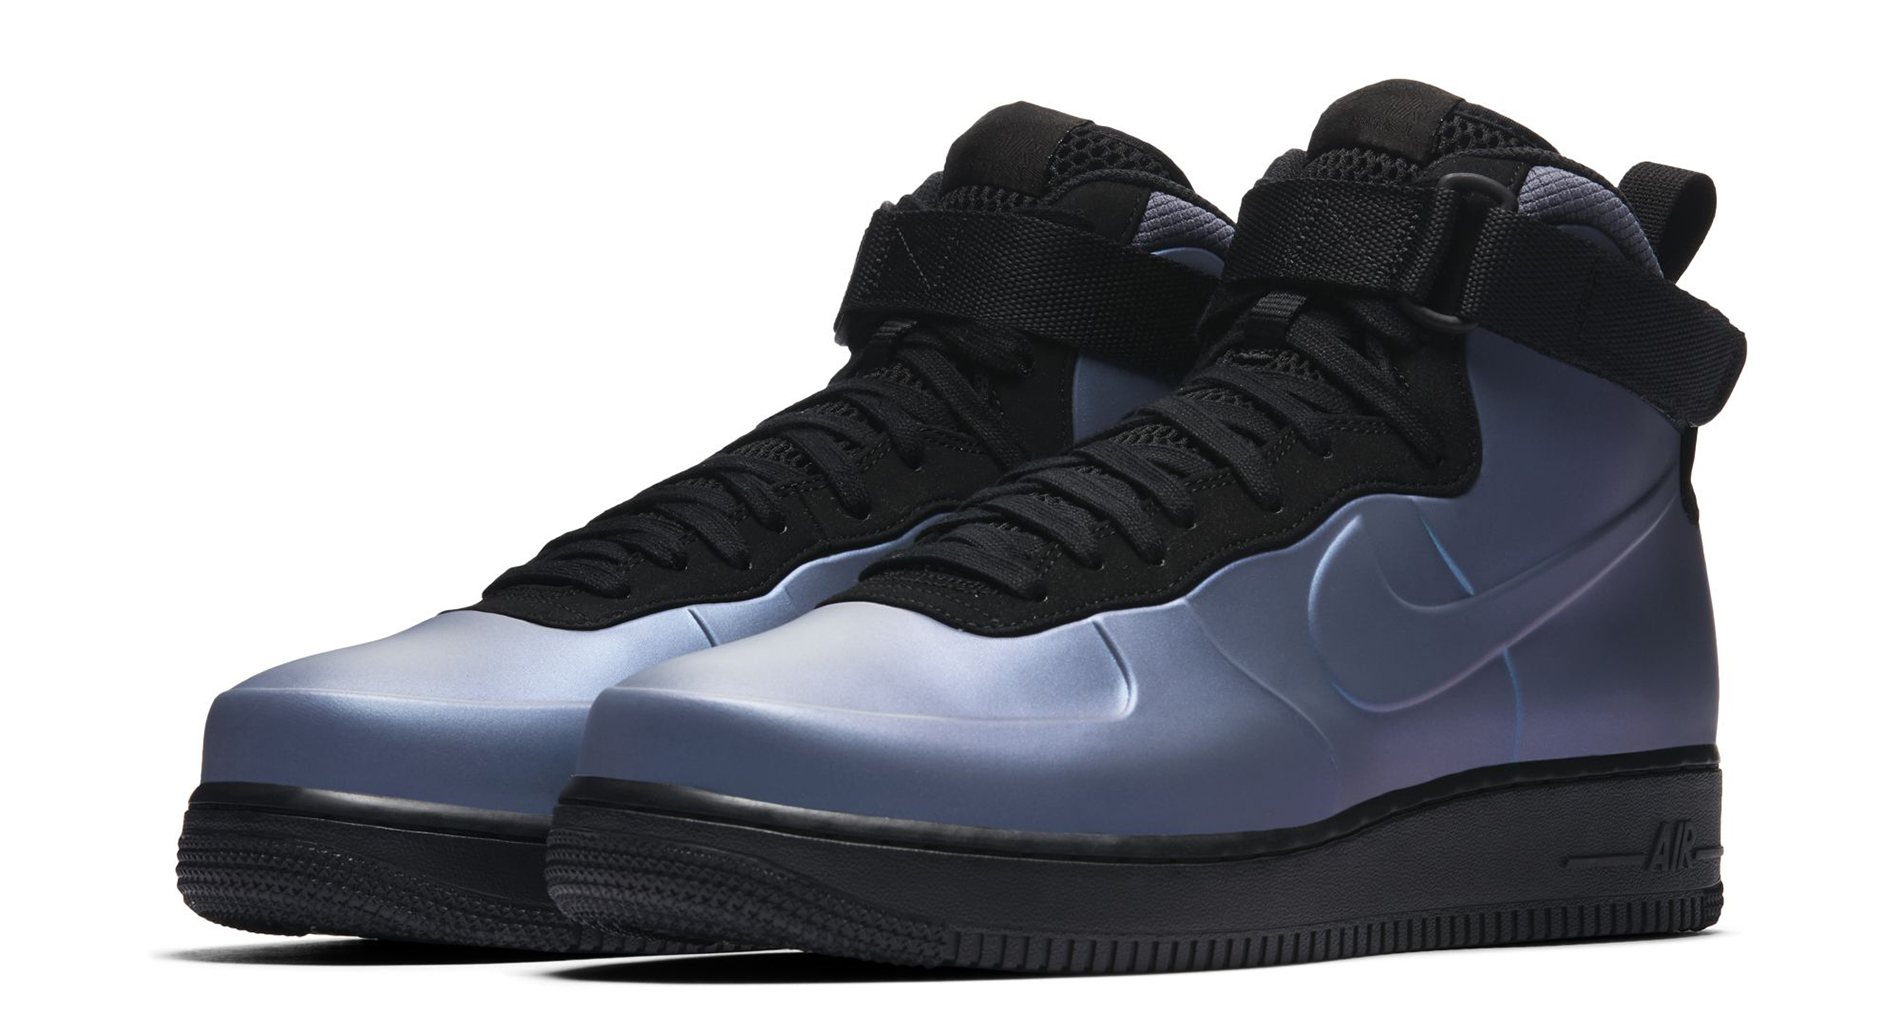 Nike Air Force 1 Foamposite Devuelve Nice En 2018 Nice Devuelve Kicks 93ab13